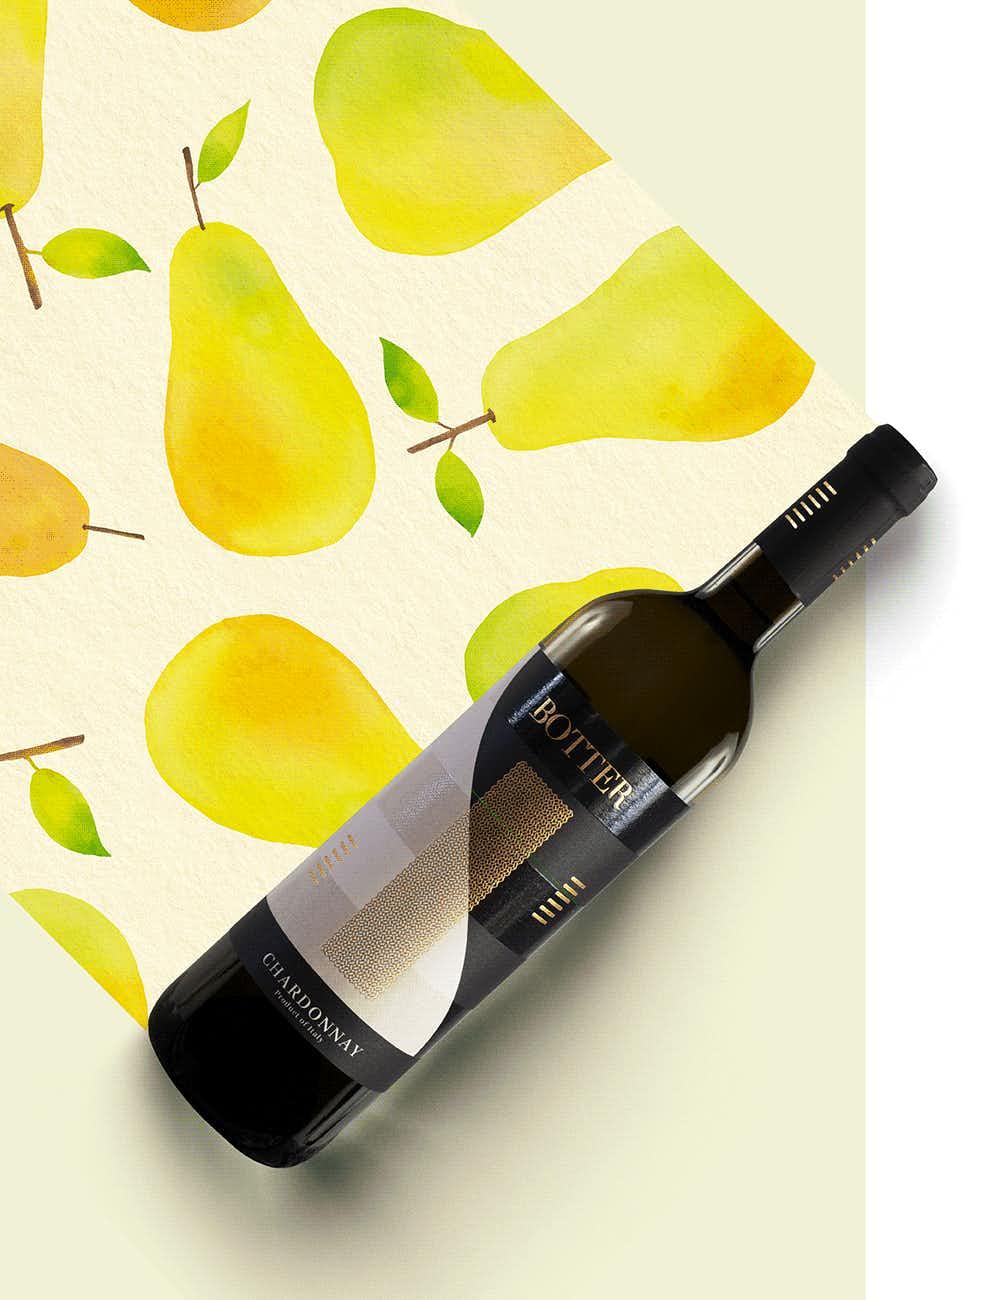 Botter Wines Chardonnay 2018